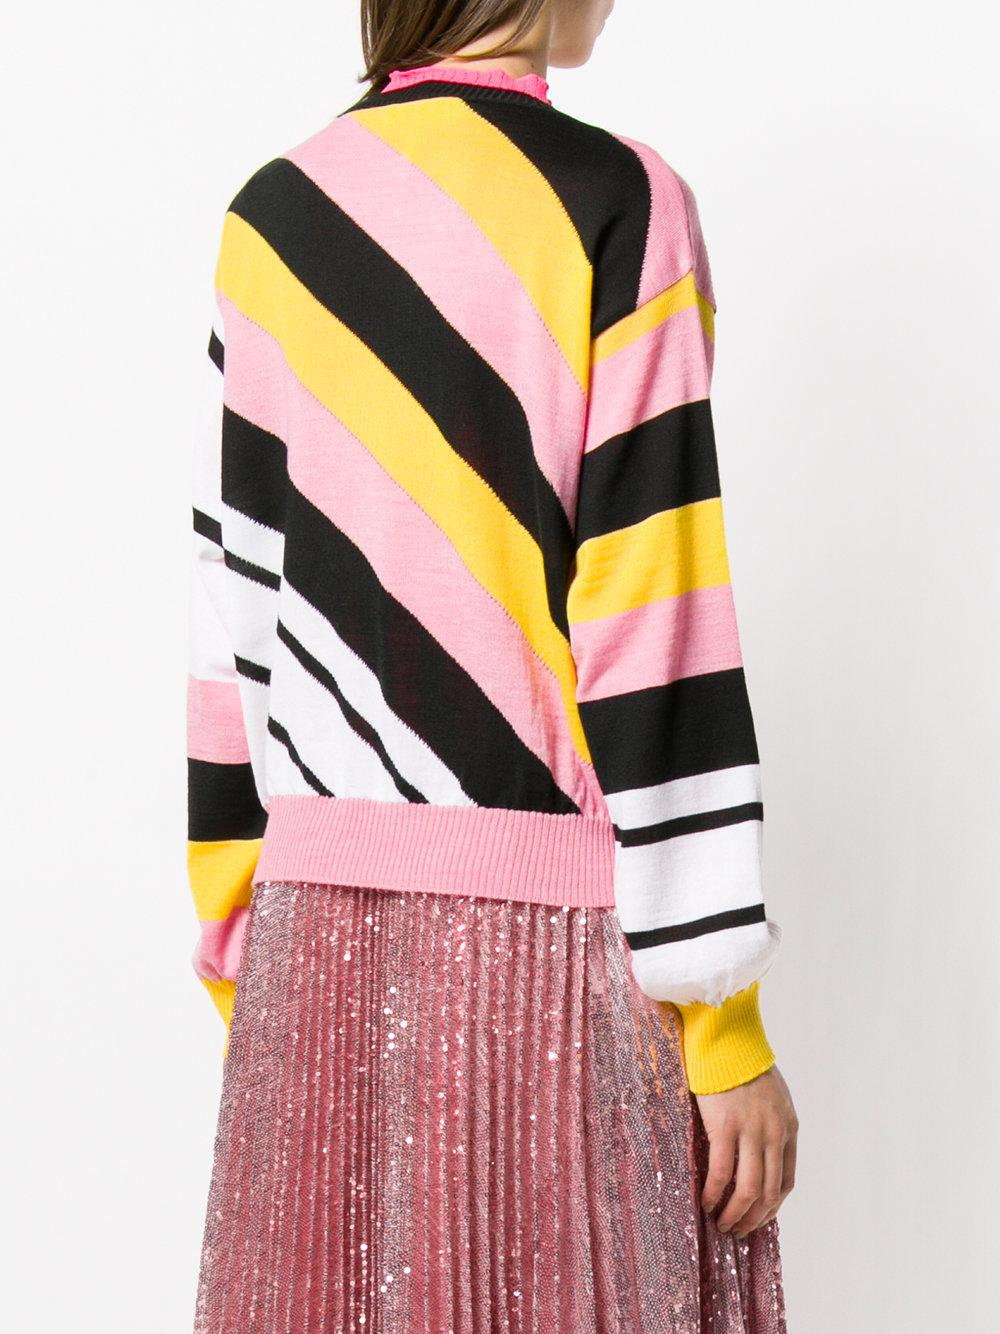 Lyst Msgm Diagonal in stripe Pink Sweater PaaqH